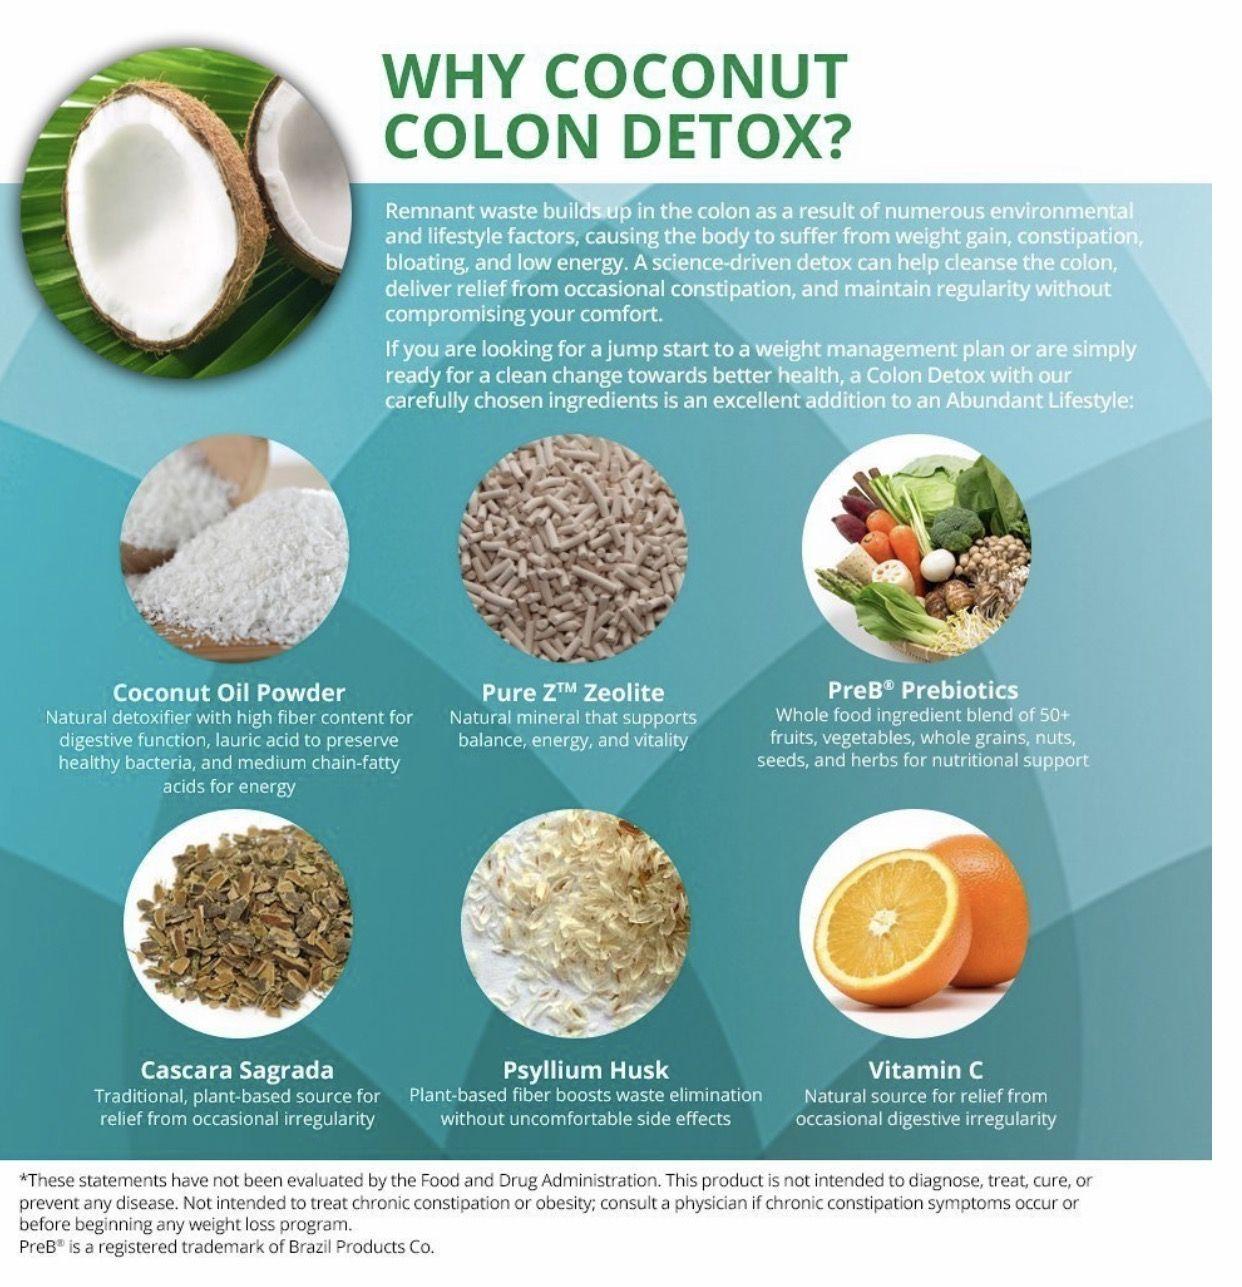 cascara sagrada powder for weight loss